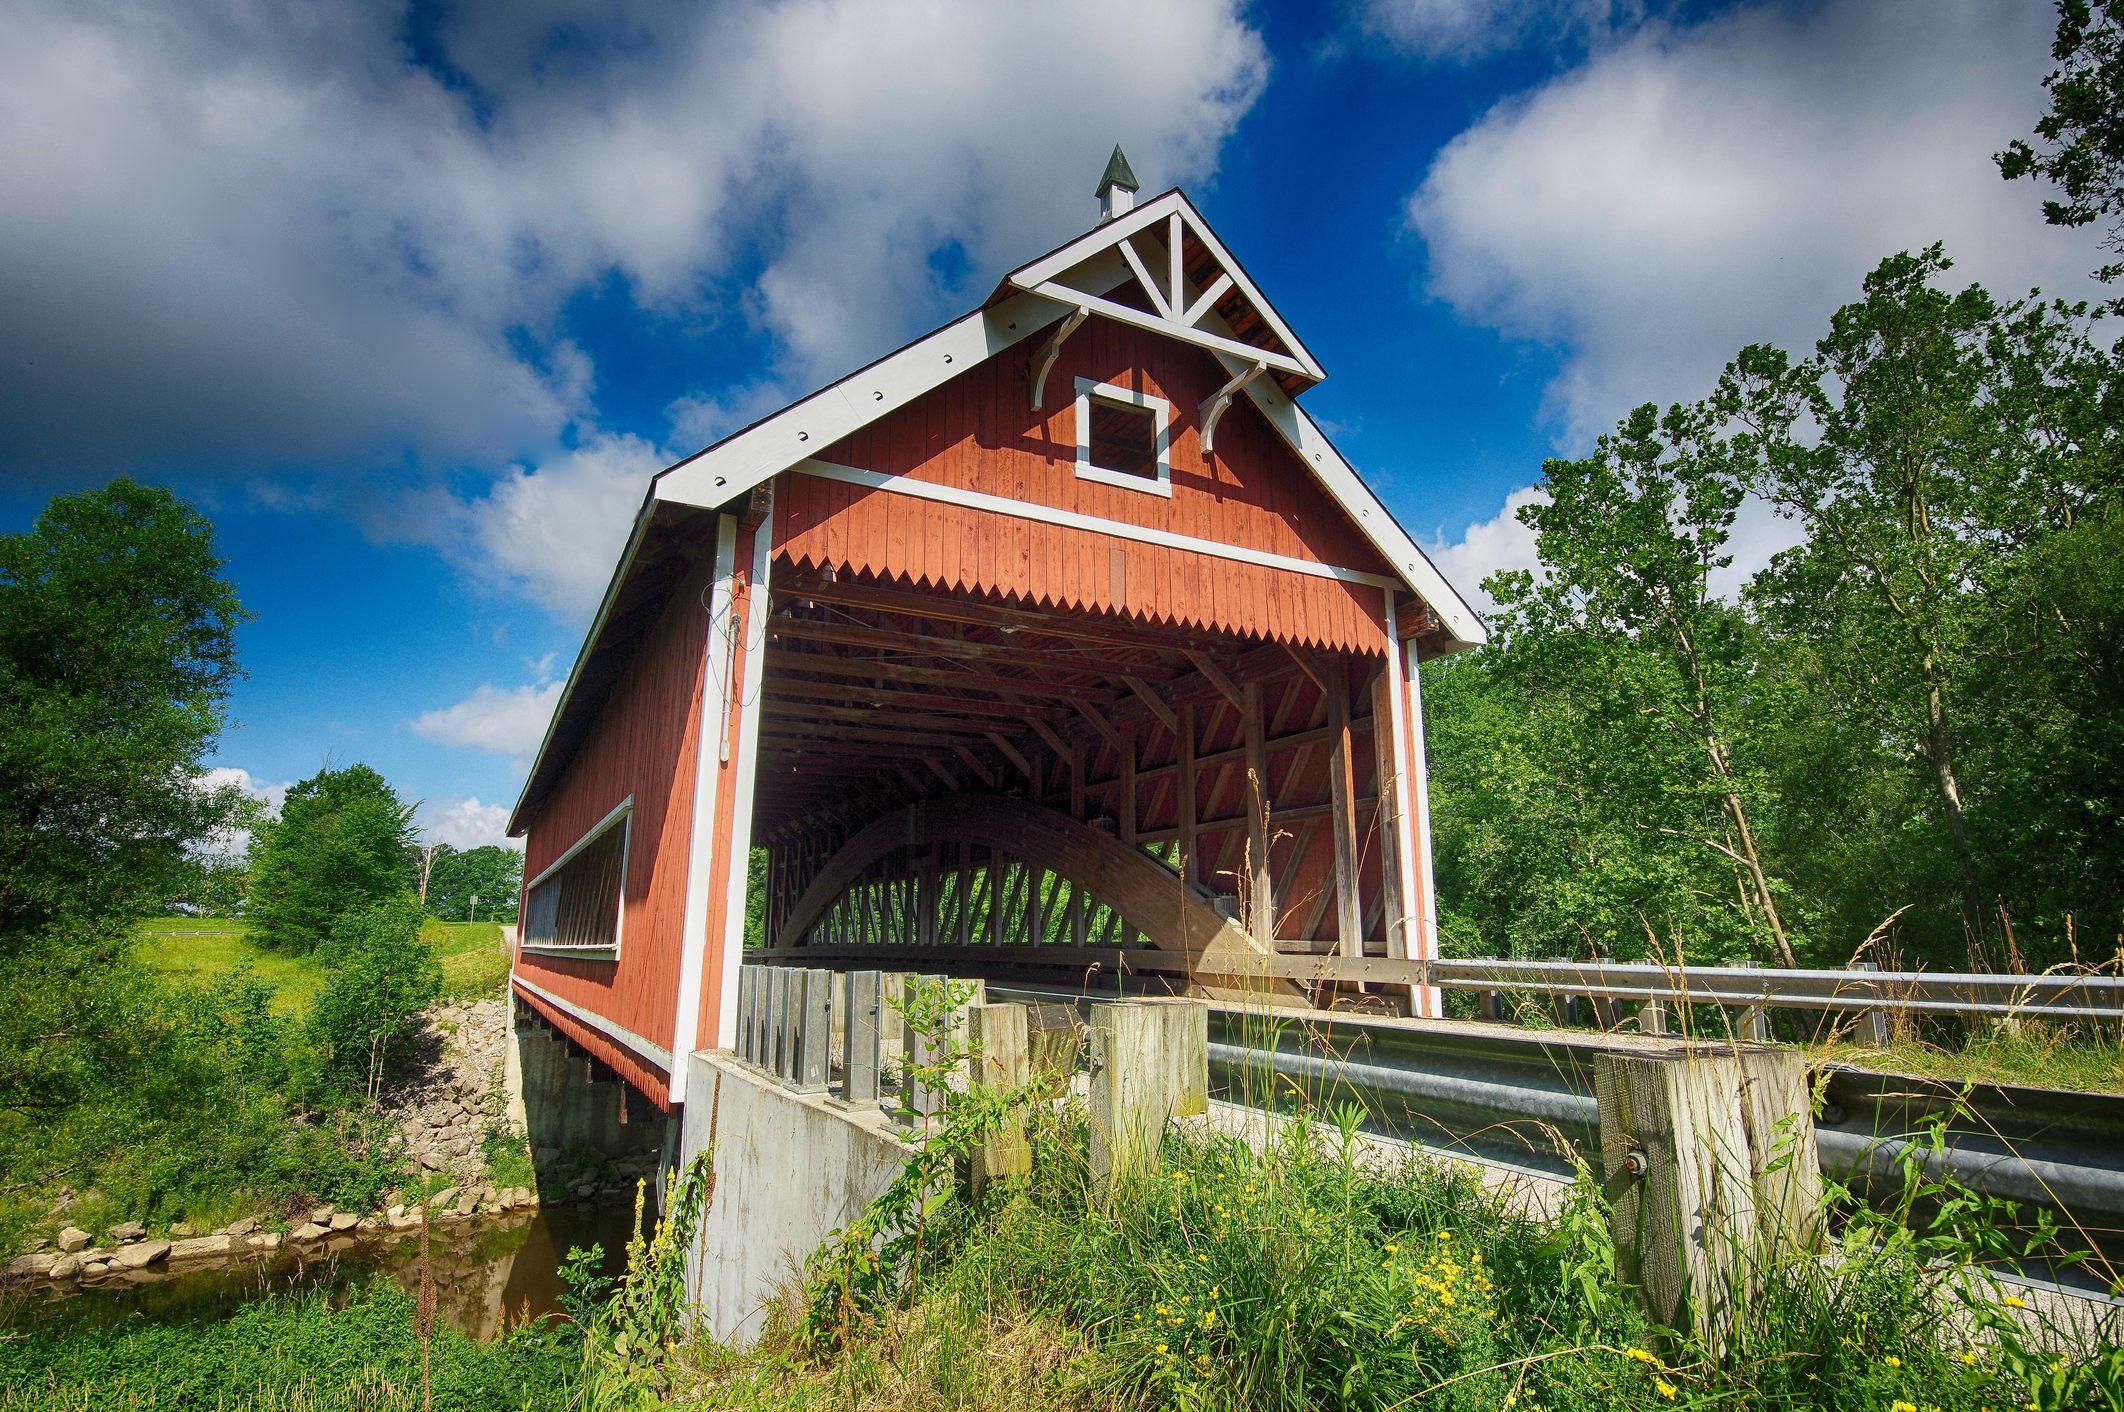 Netcher Road Covered Bridge